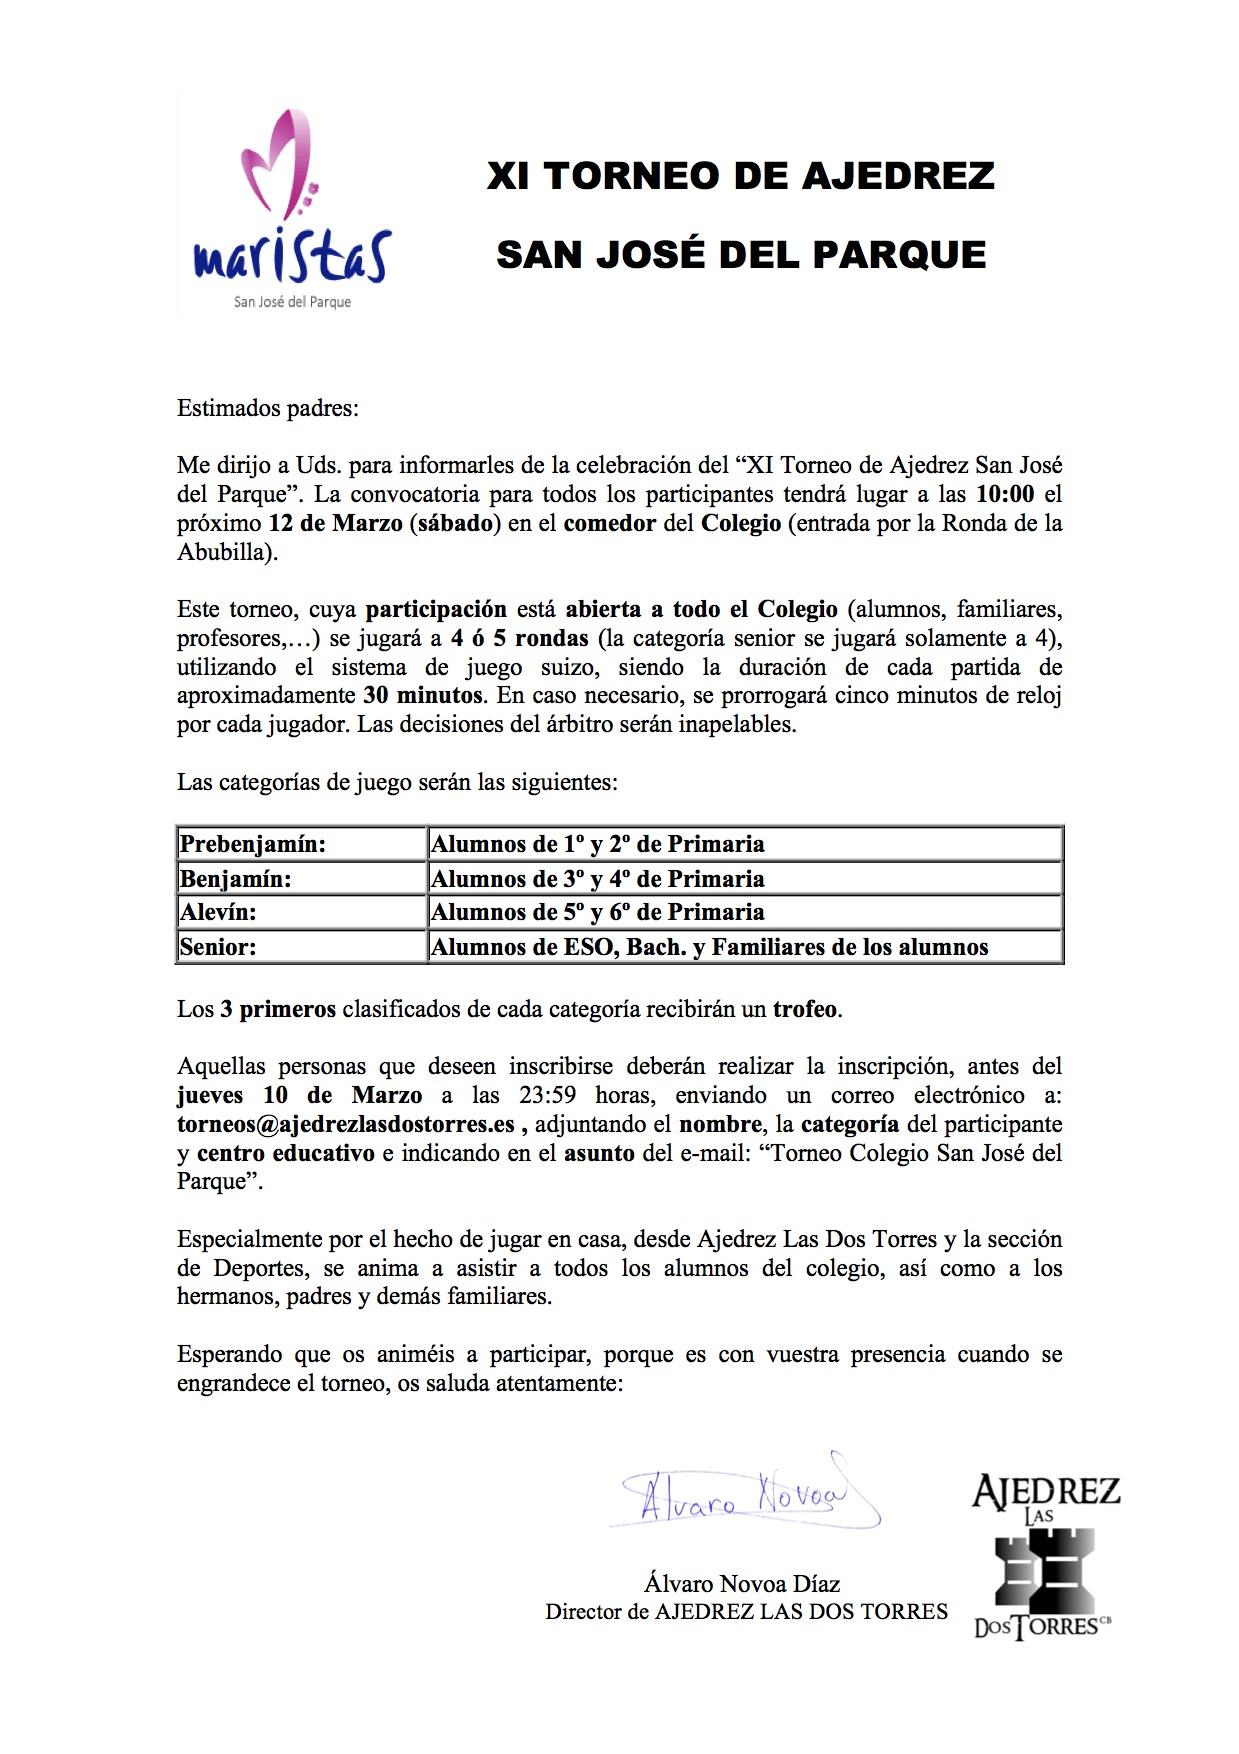 XI TORNEO SAN JOSE DEL PARQUE.doc